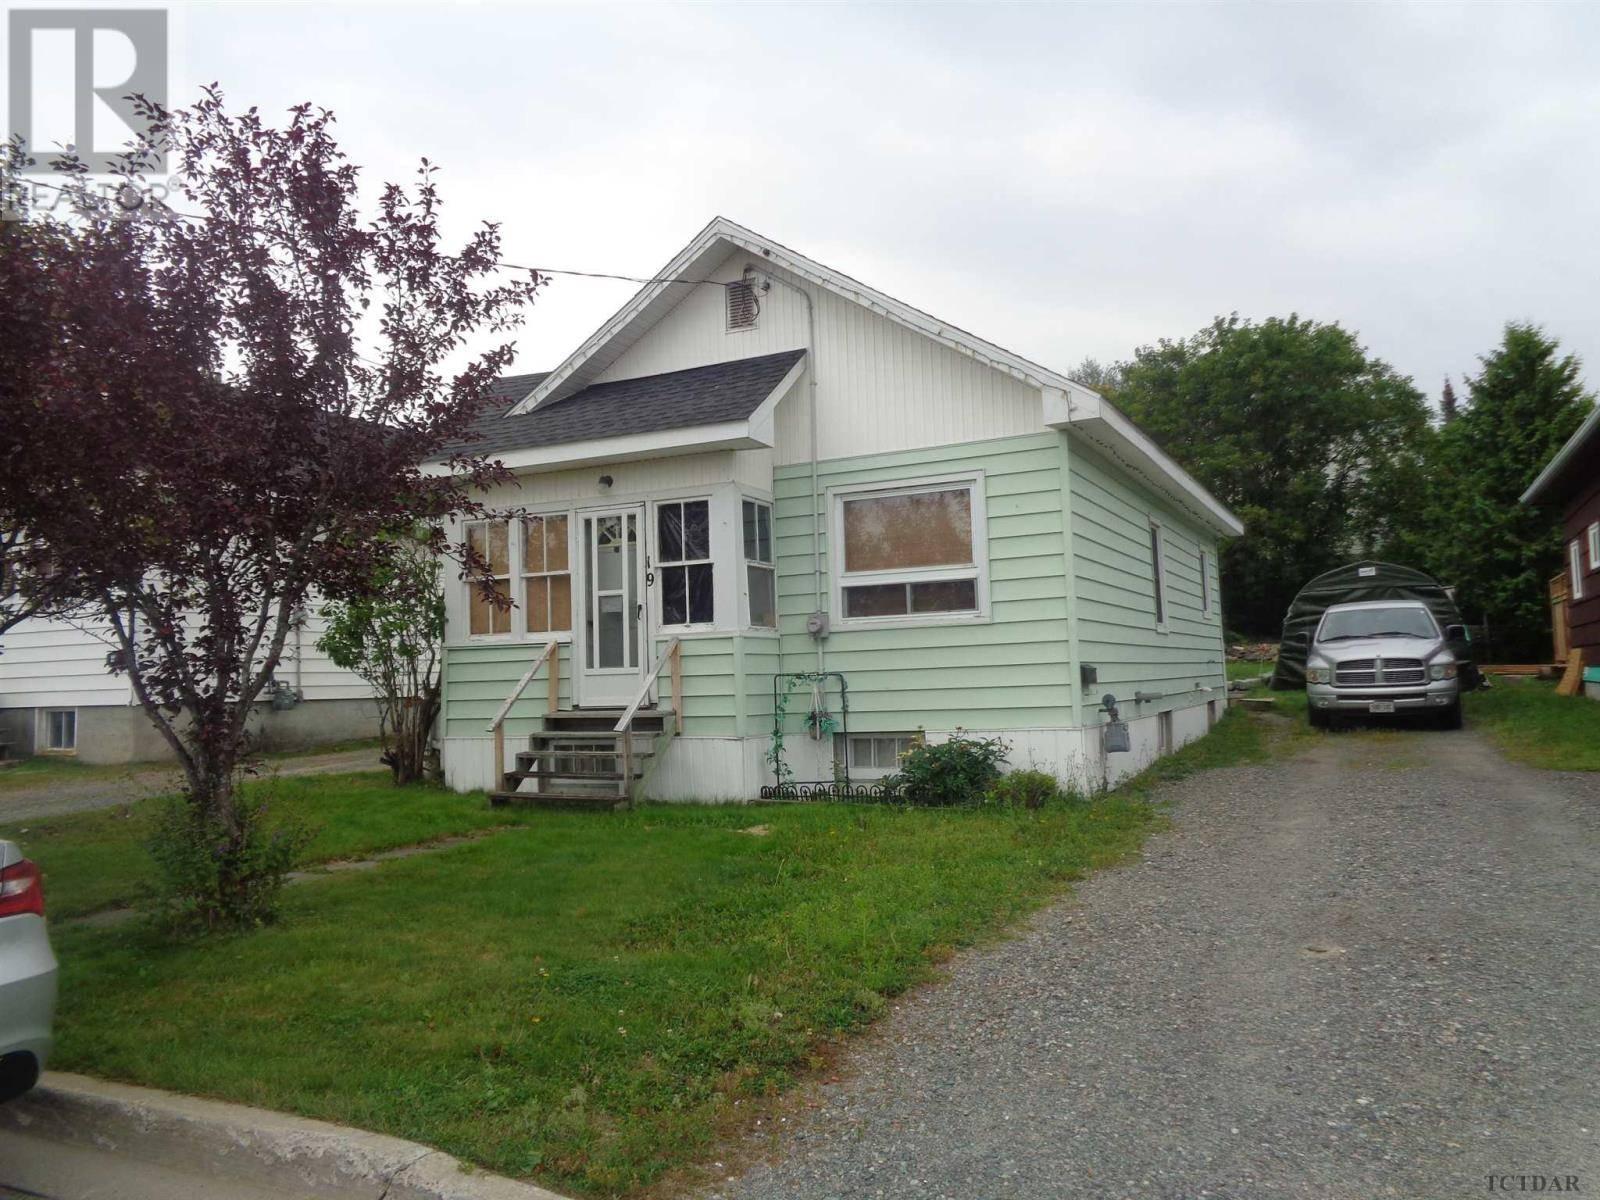 House for sale at 19 Premier Ave W Kirkland Lake Ontario - MLS: TM182086